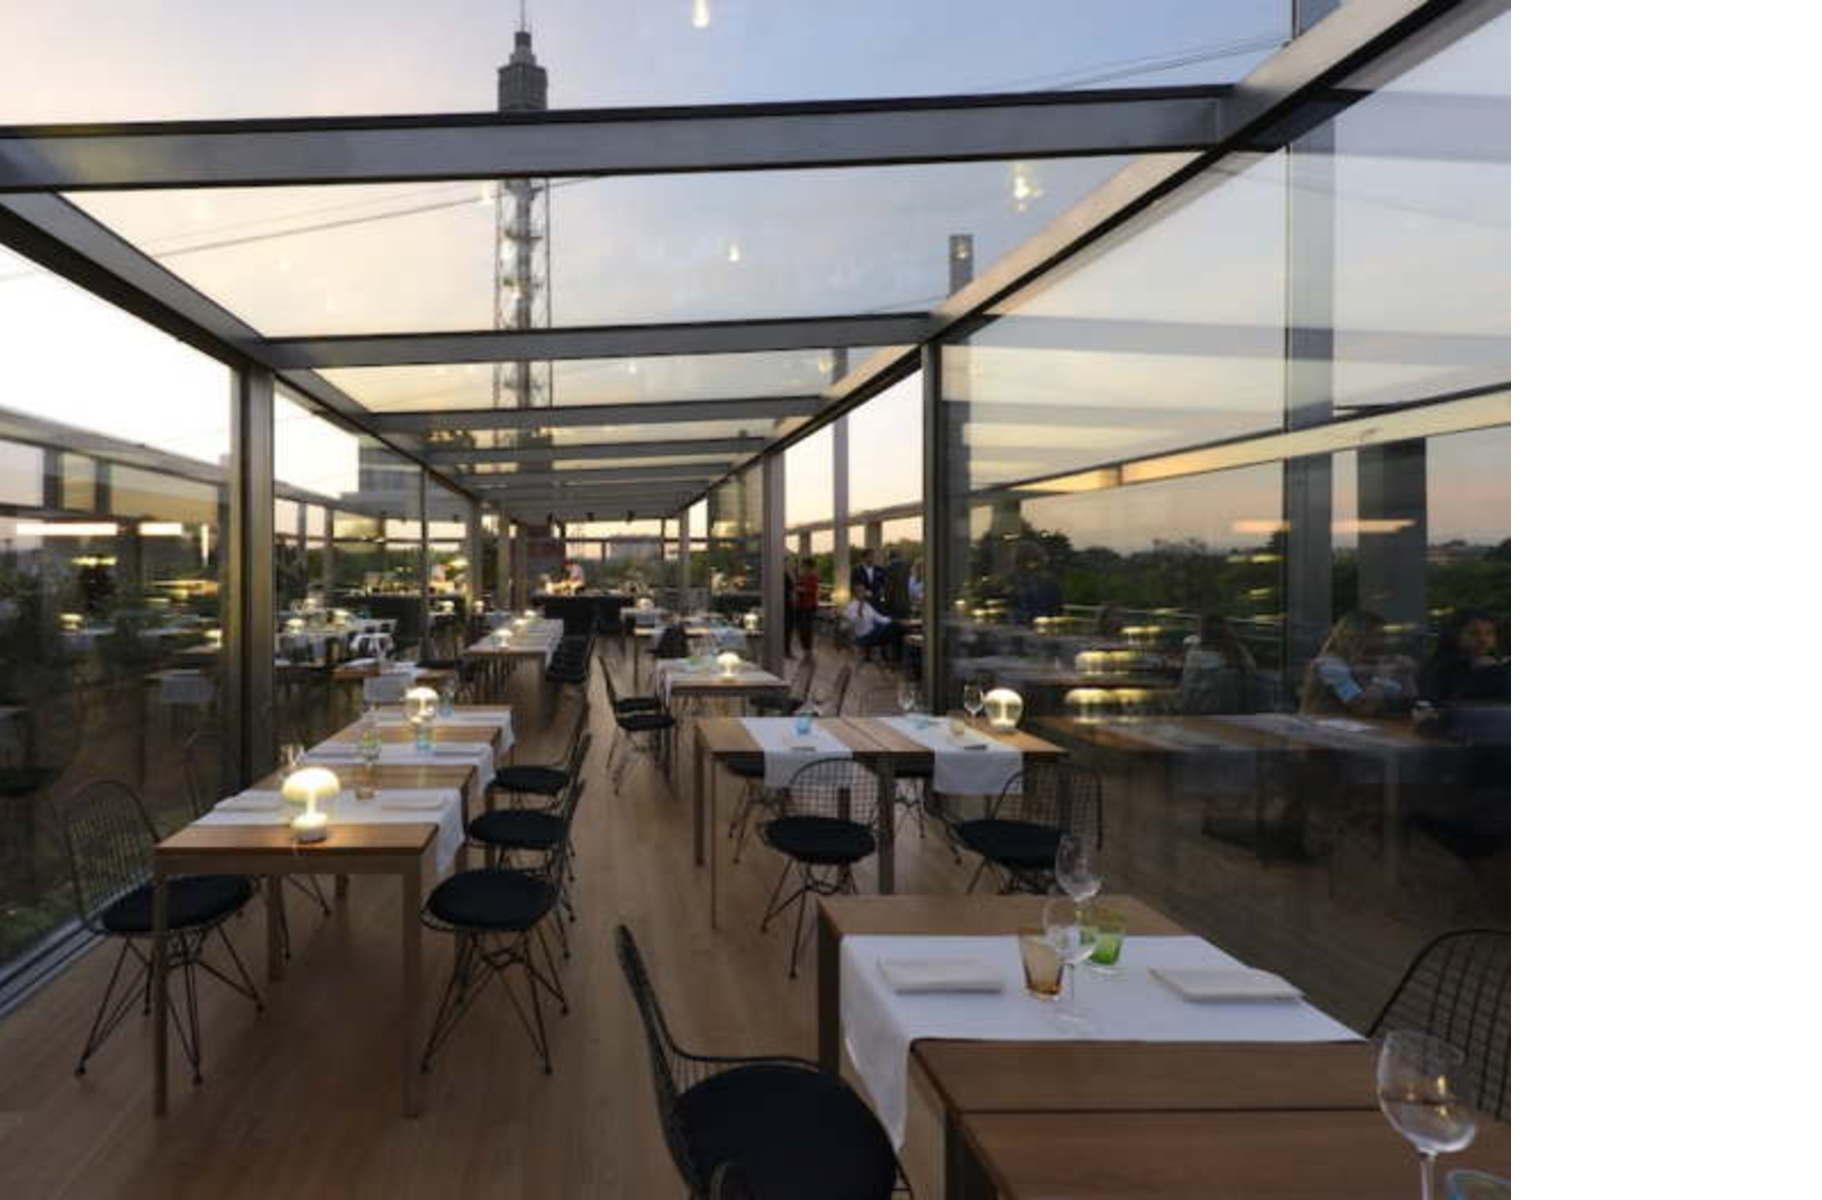 OBR Restaurant Terrazza Triennale Milan  Floornature